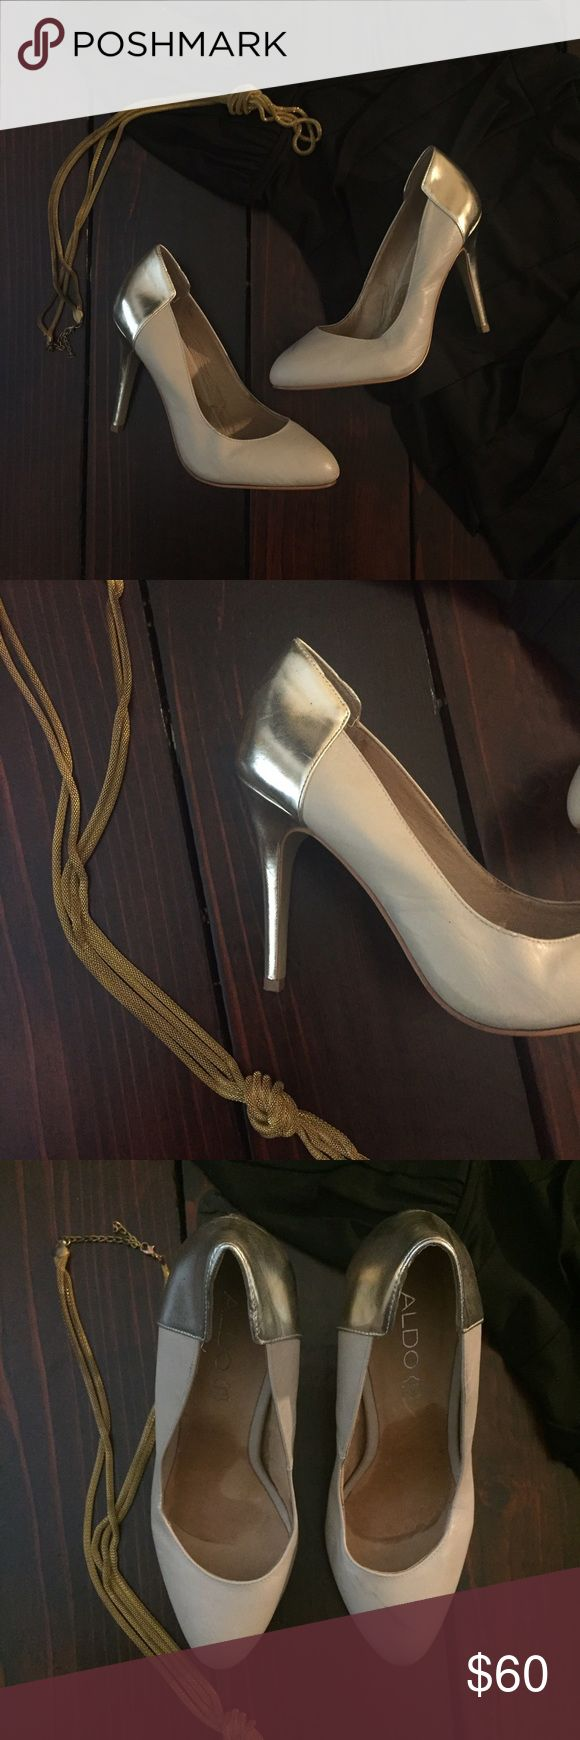 Aldo Leather Beige\ Gold pumps Like-new pumps. 4 inch heels Aldo Shoes Heels